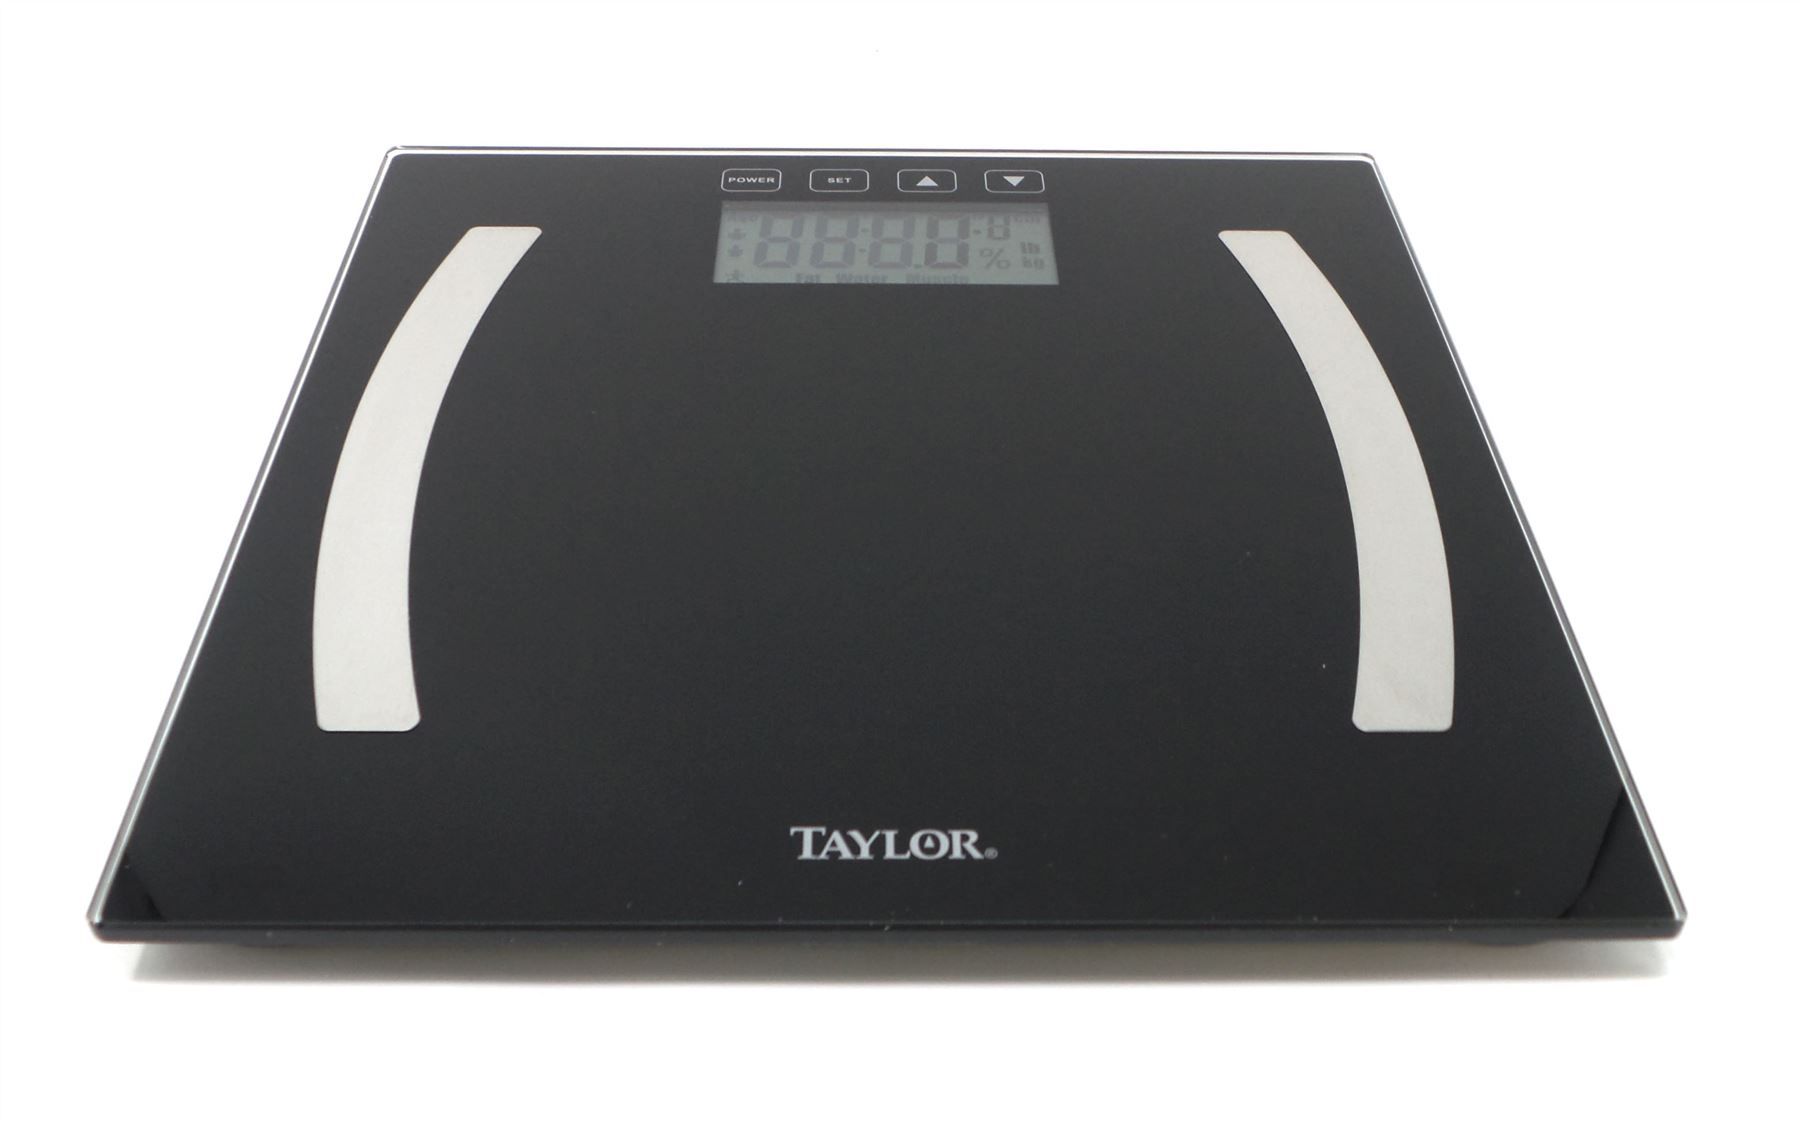 retro digital scales taylor glass scale bathroom product